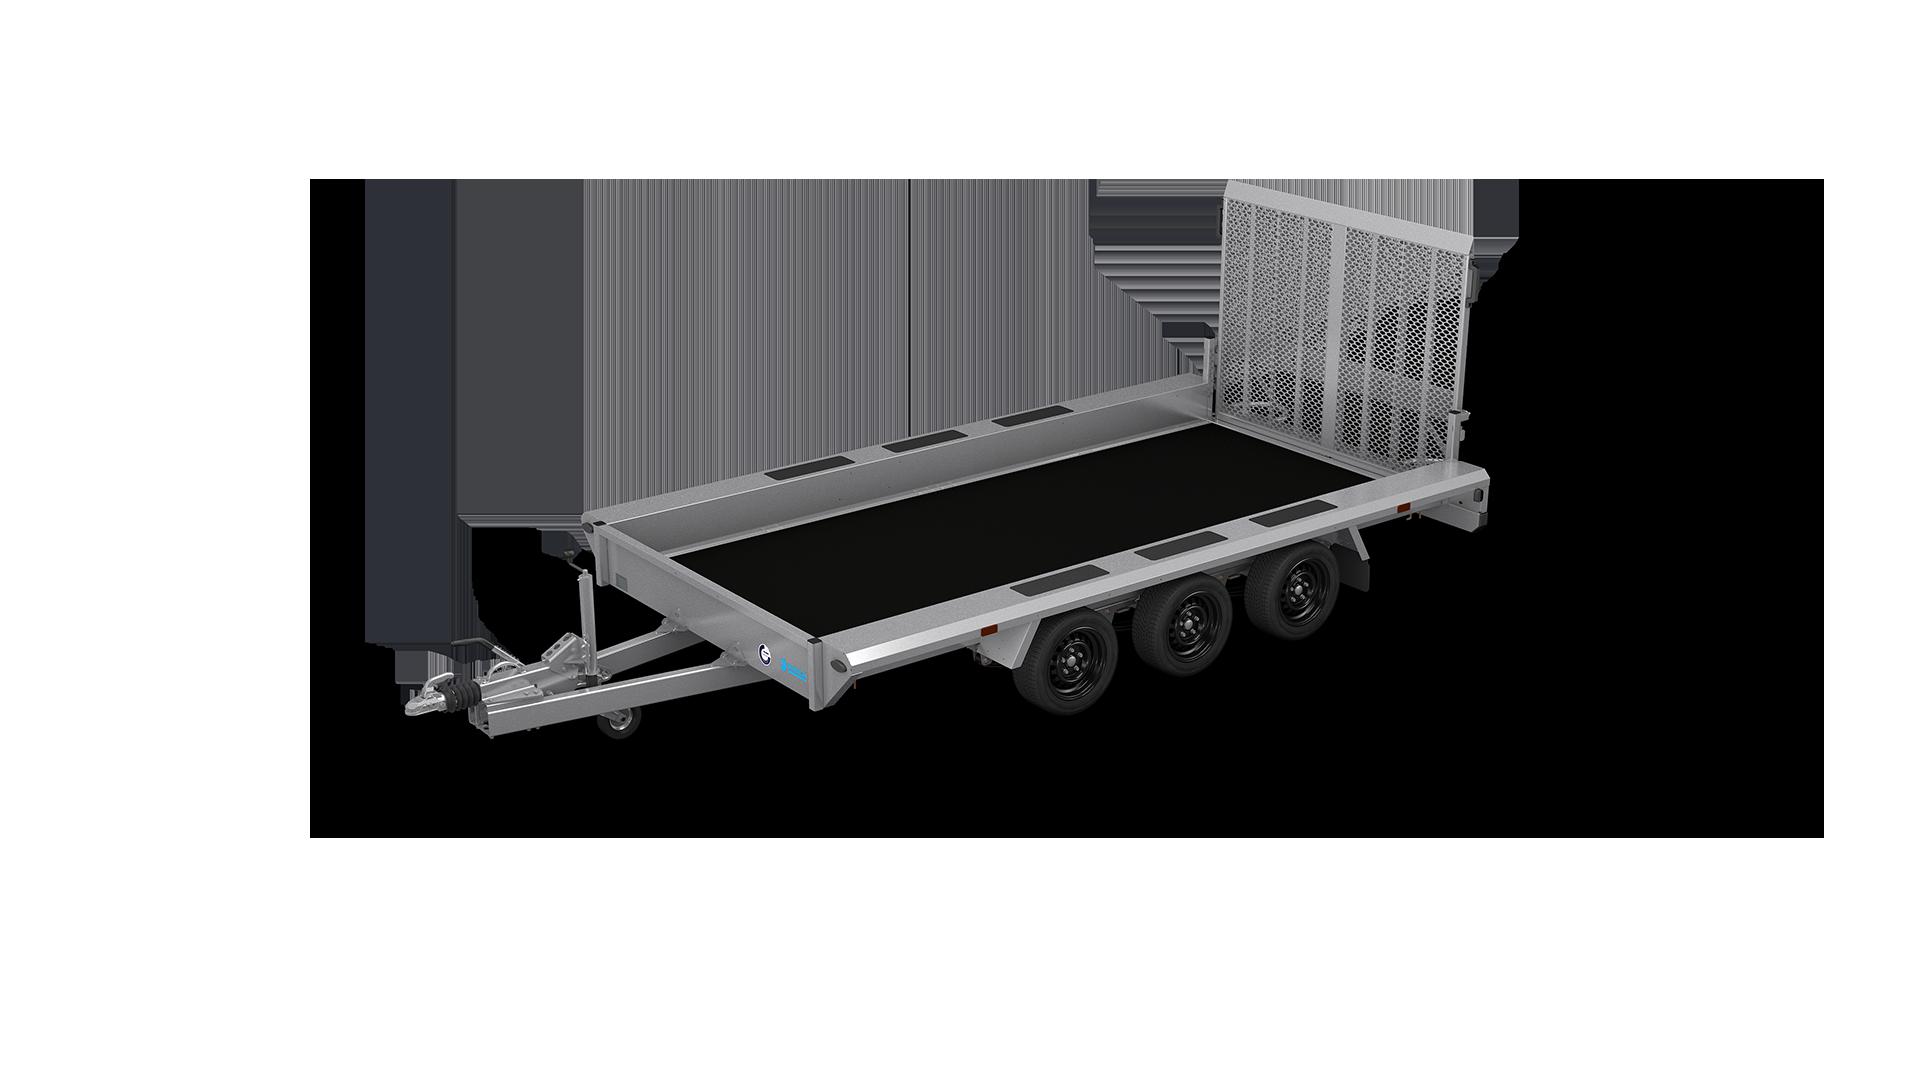 HAPERT transport trailer INDIGO LF-3 non-tilting machine transporter